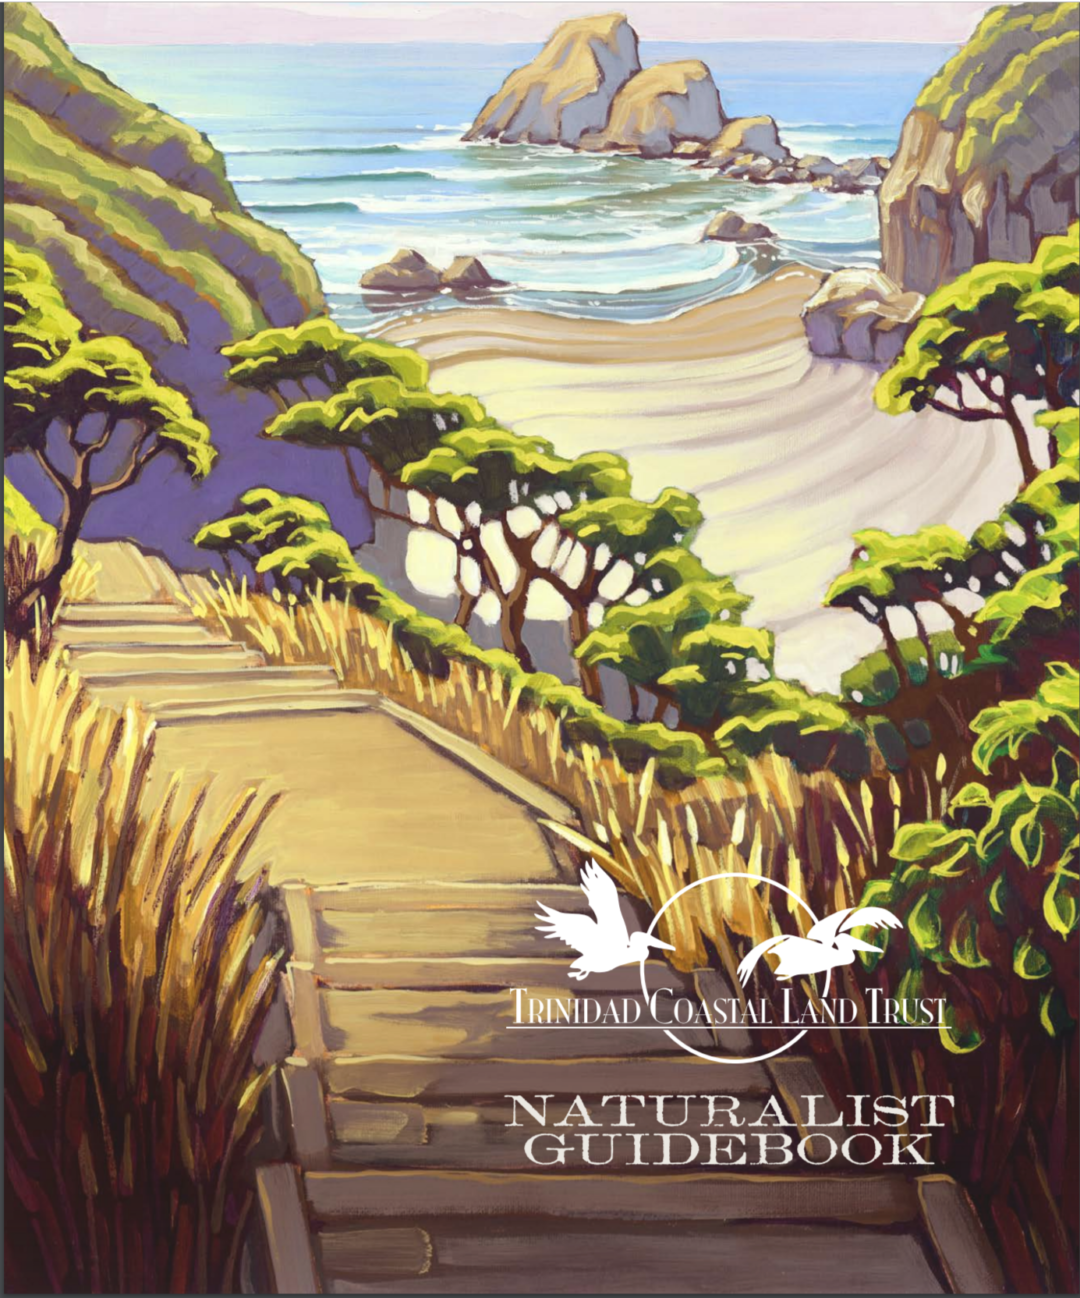 Trinidad Coastal Land Trust (TCLT) Naturalist Guidebook and Docent Manual